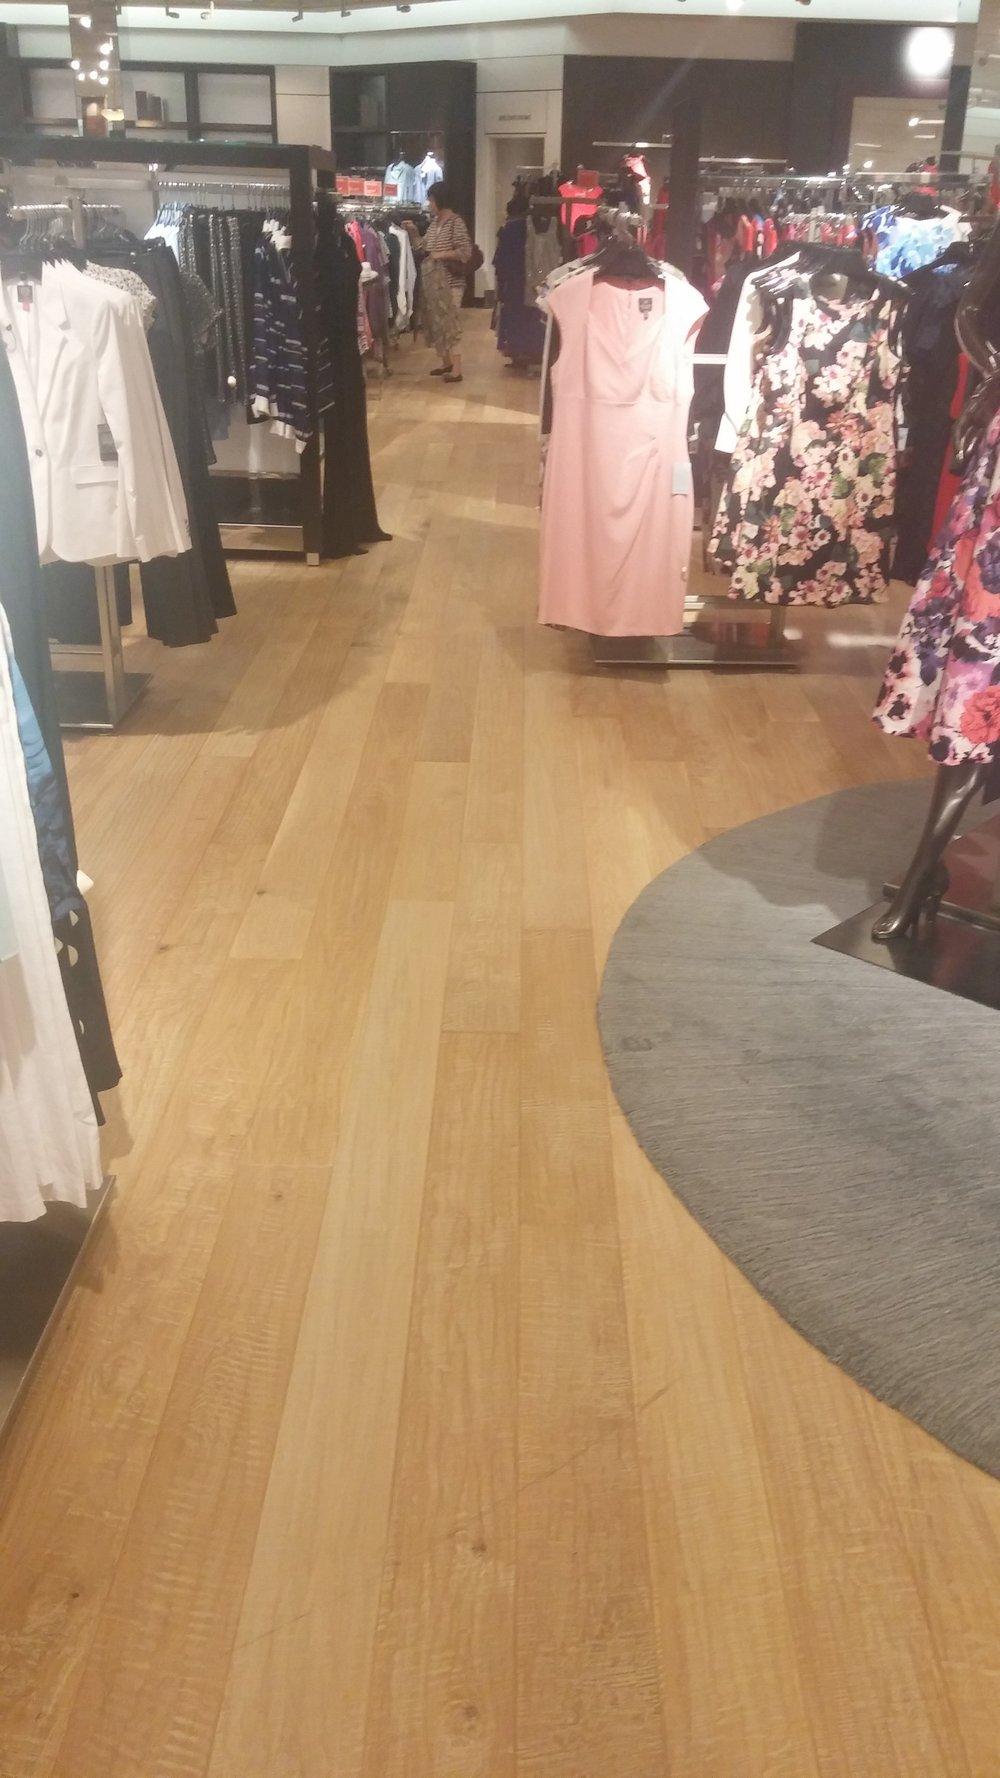 Major Retail-0017.jpg